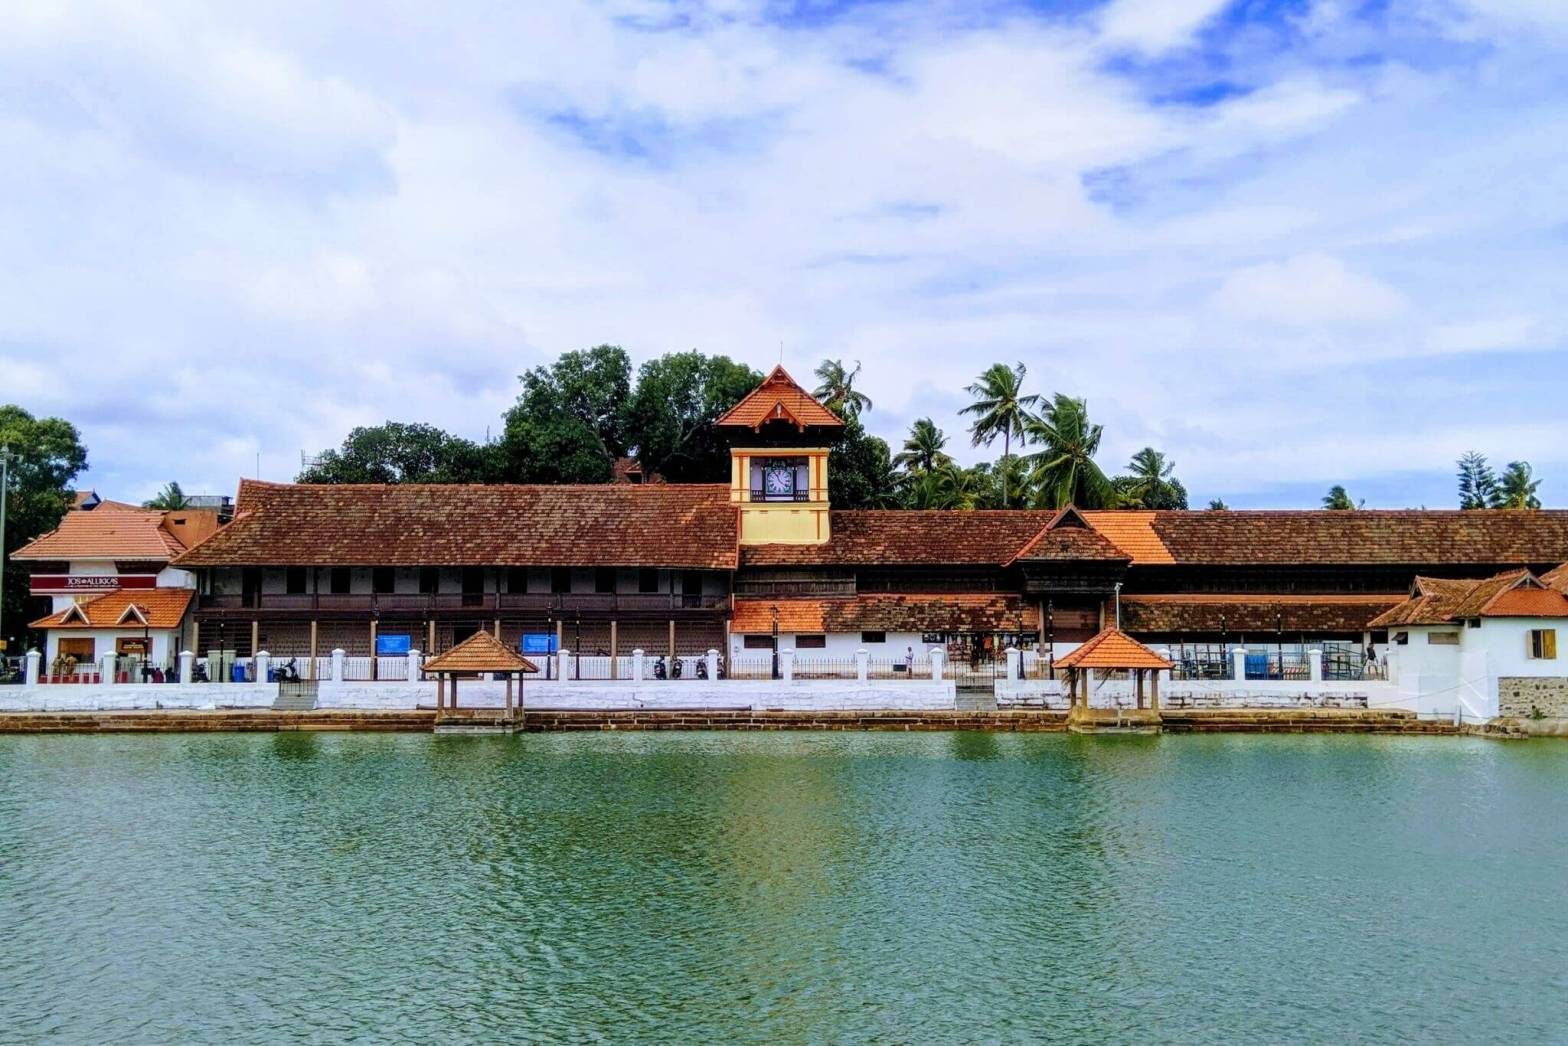 One Day Thiruvananthapuram Local Sightseeing Trip by Car